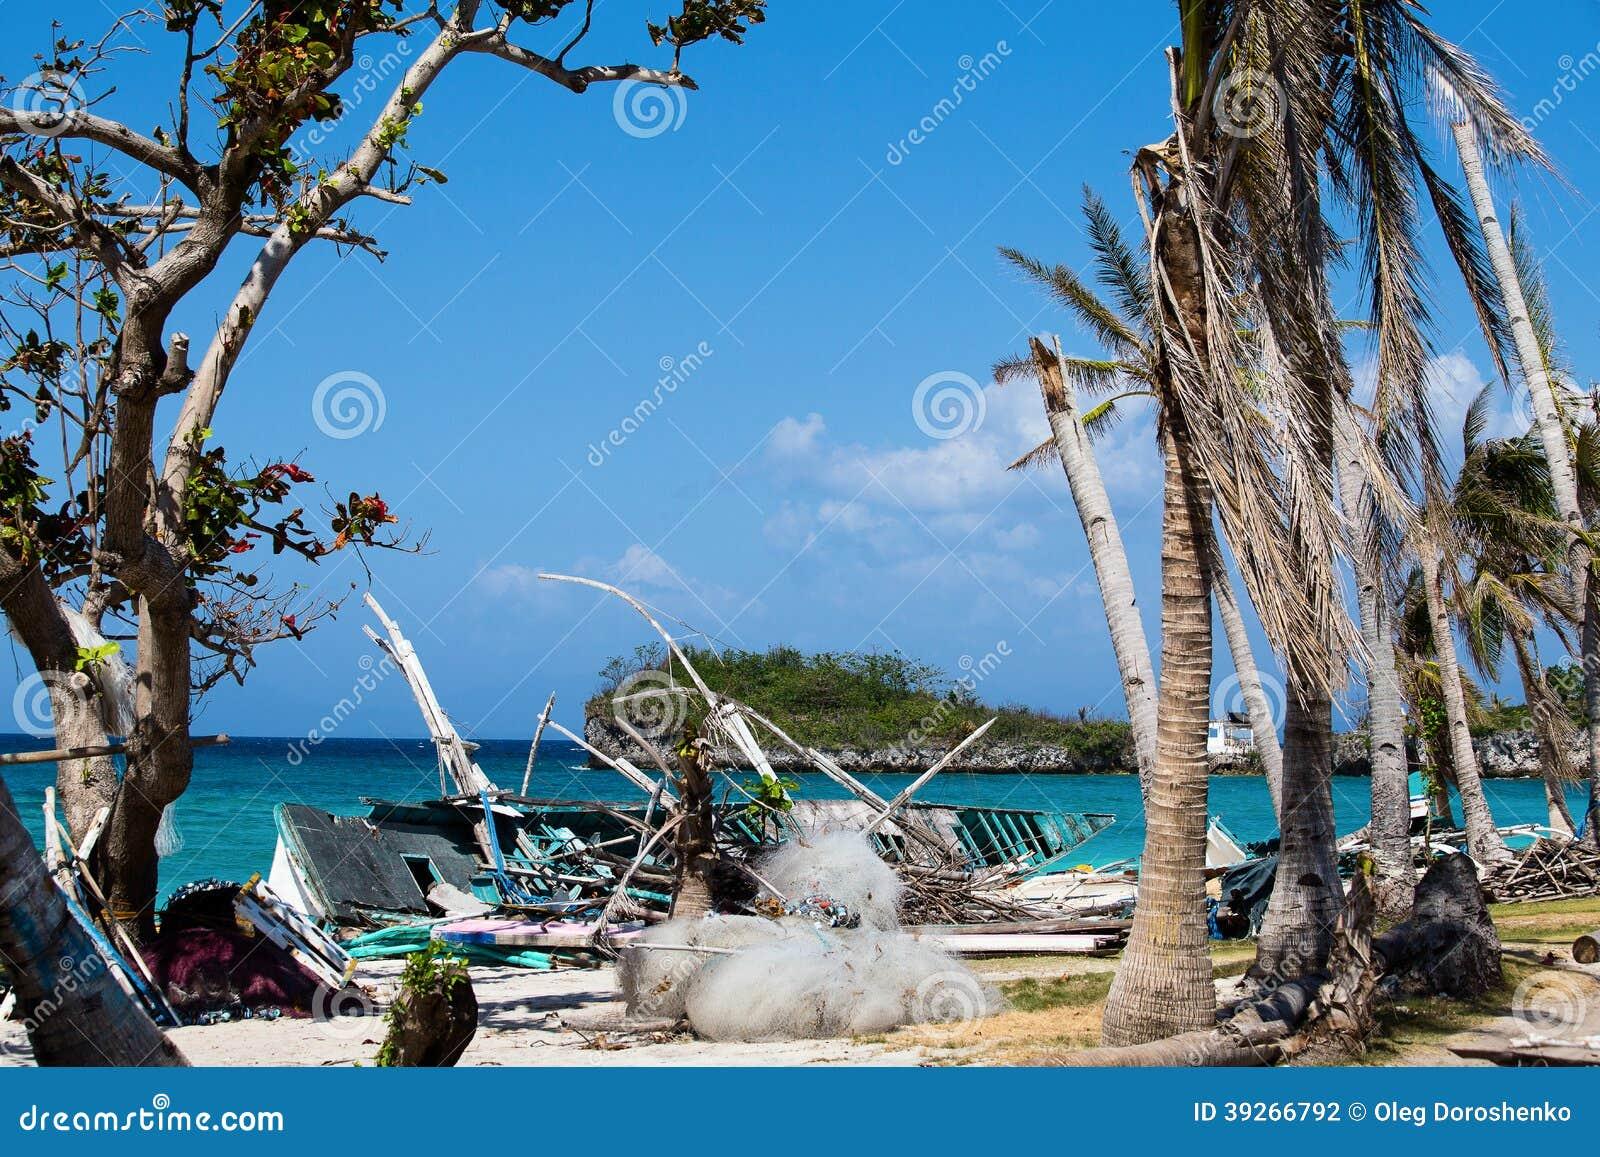 Остров Malapascua после тайфуна, Филиппин